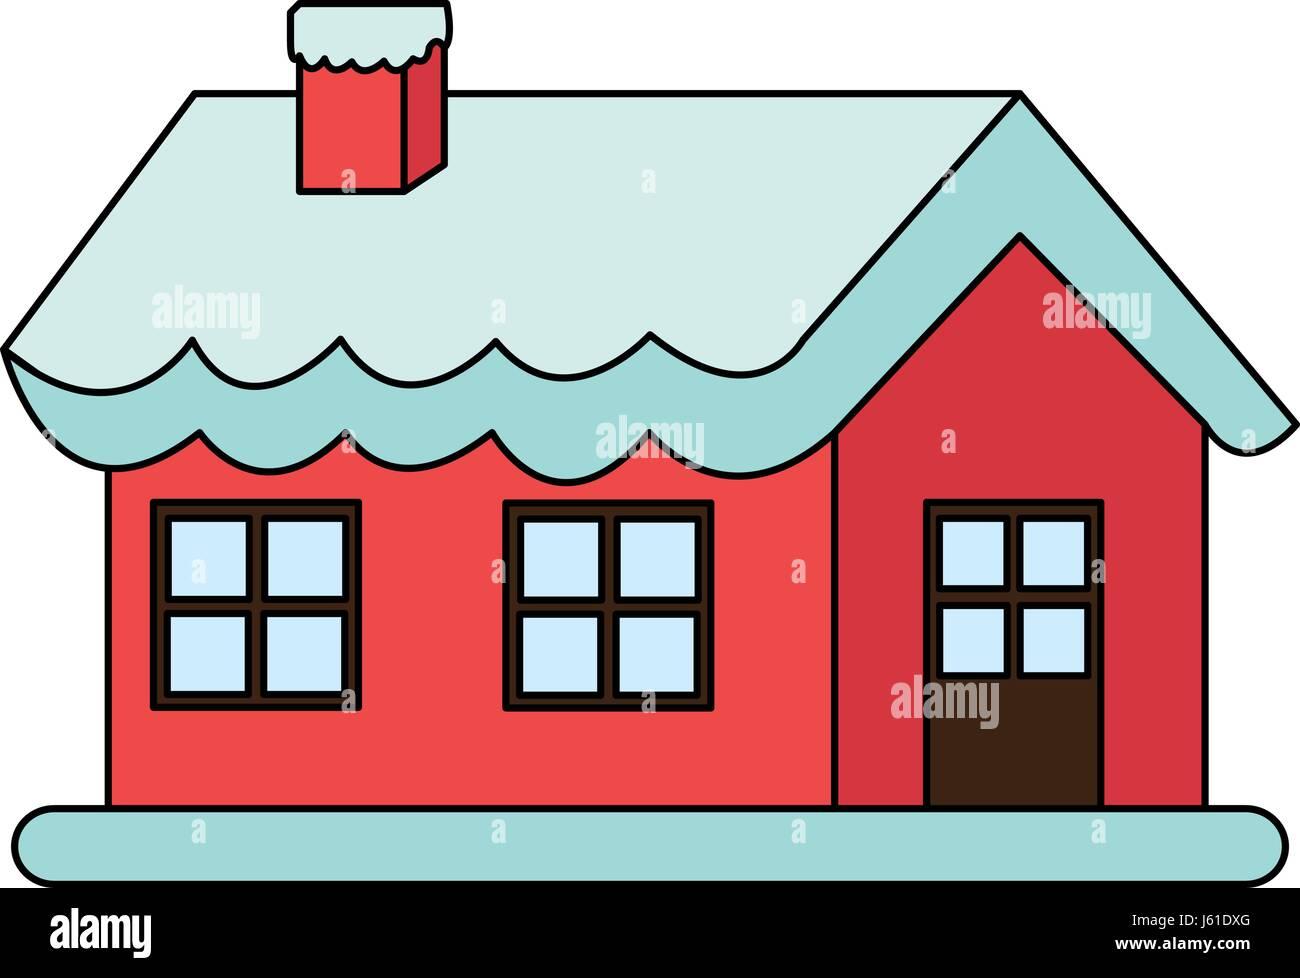 Christmas house with snow art - Stock Vector Color Image Cartoon Christmas House With Snow And Chimney